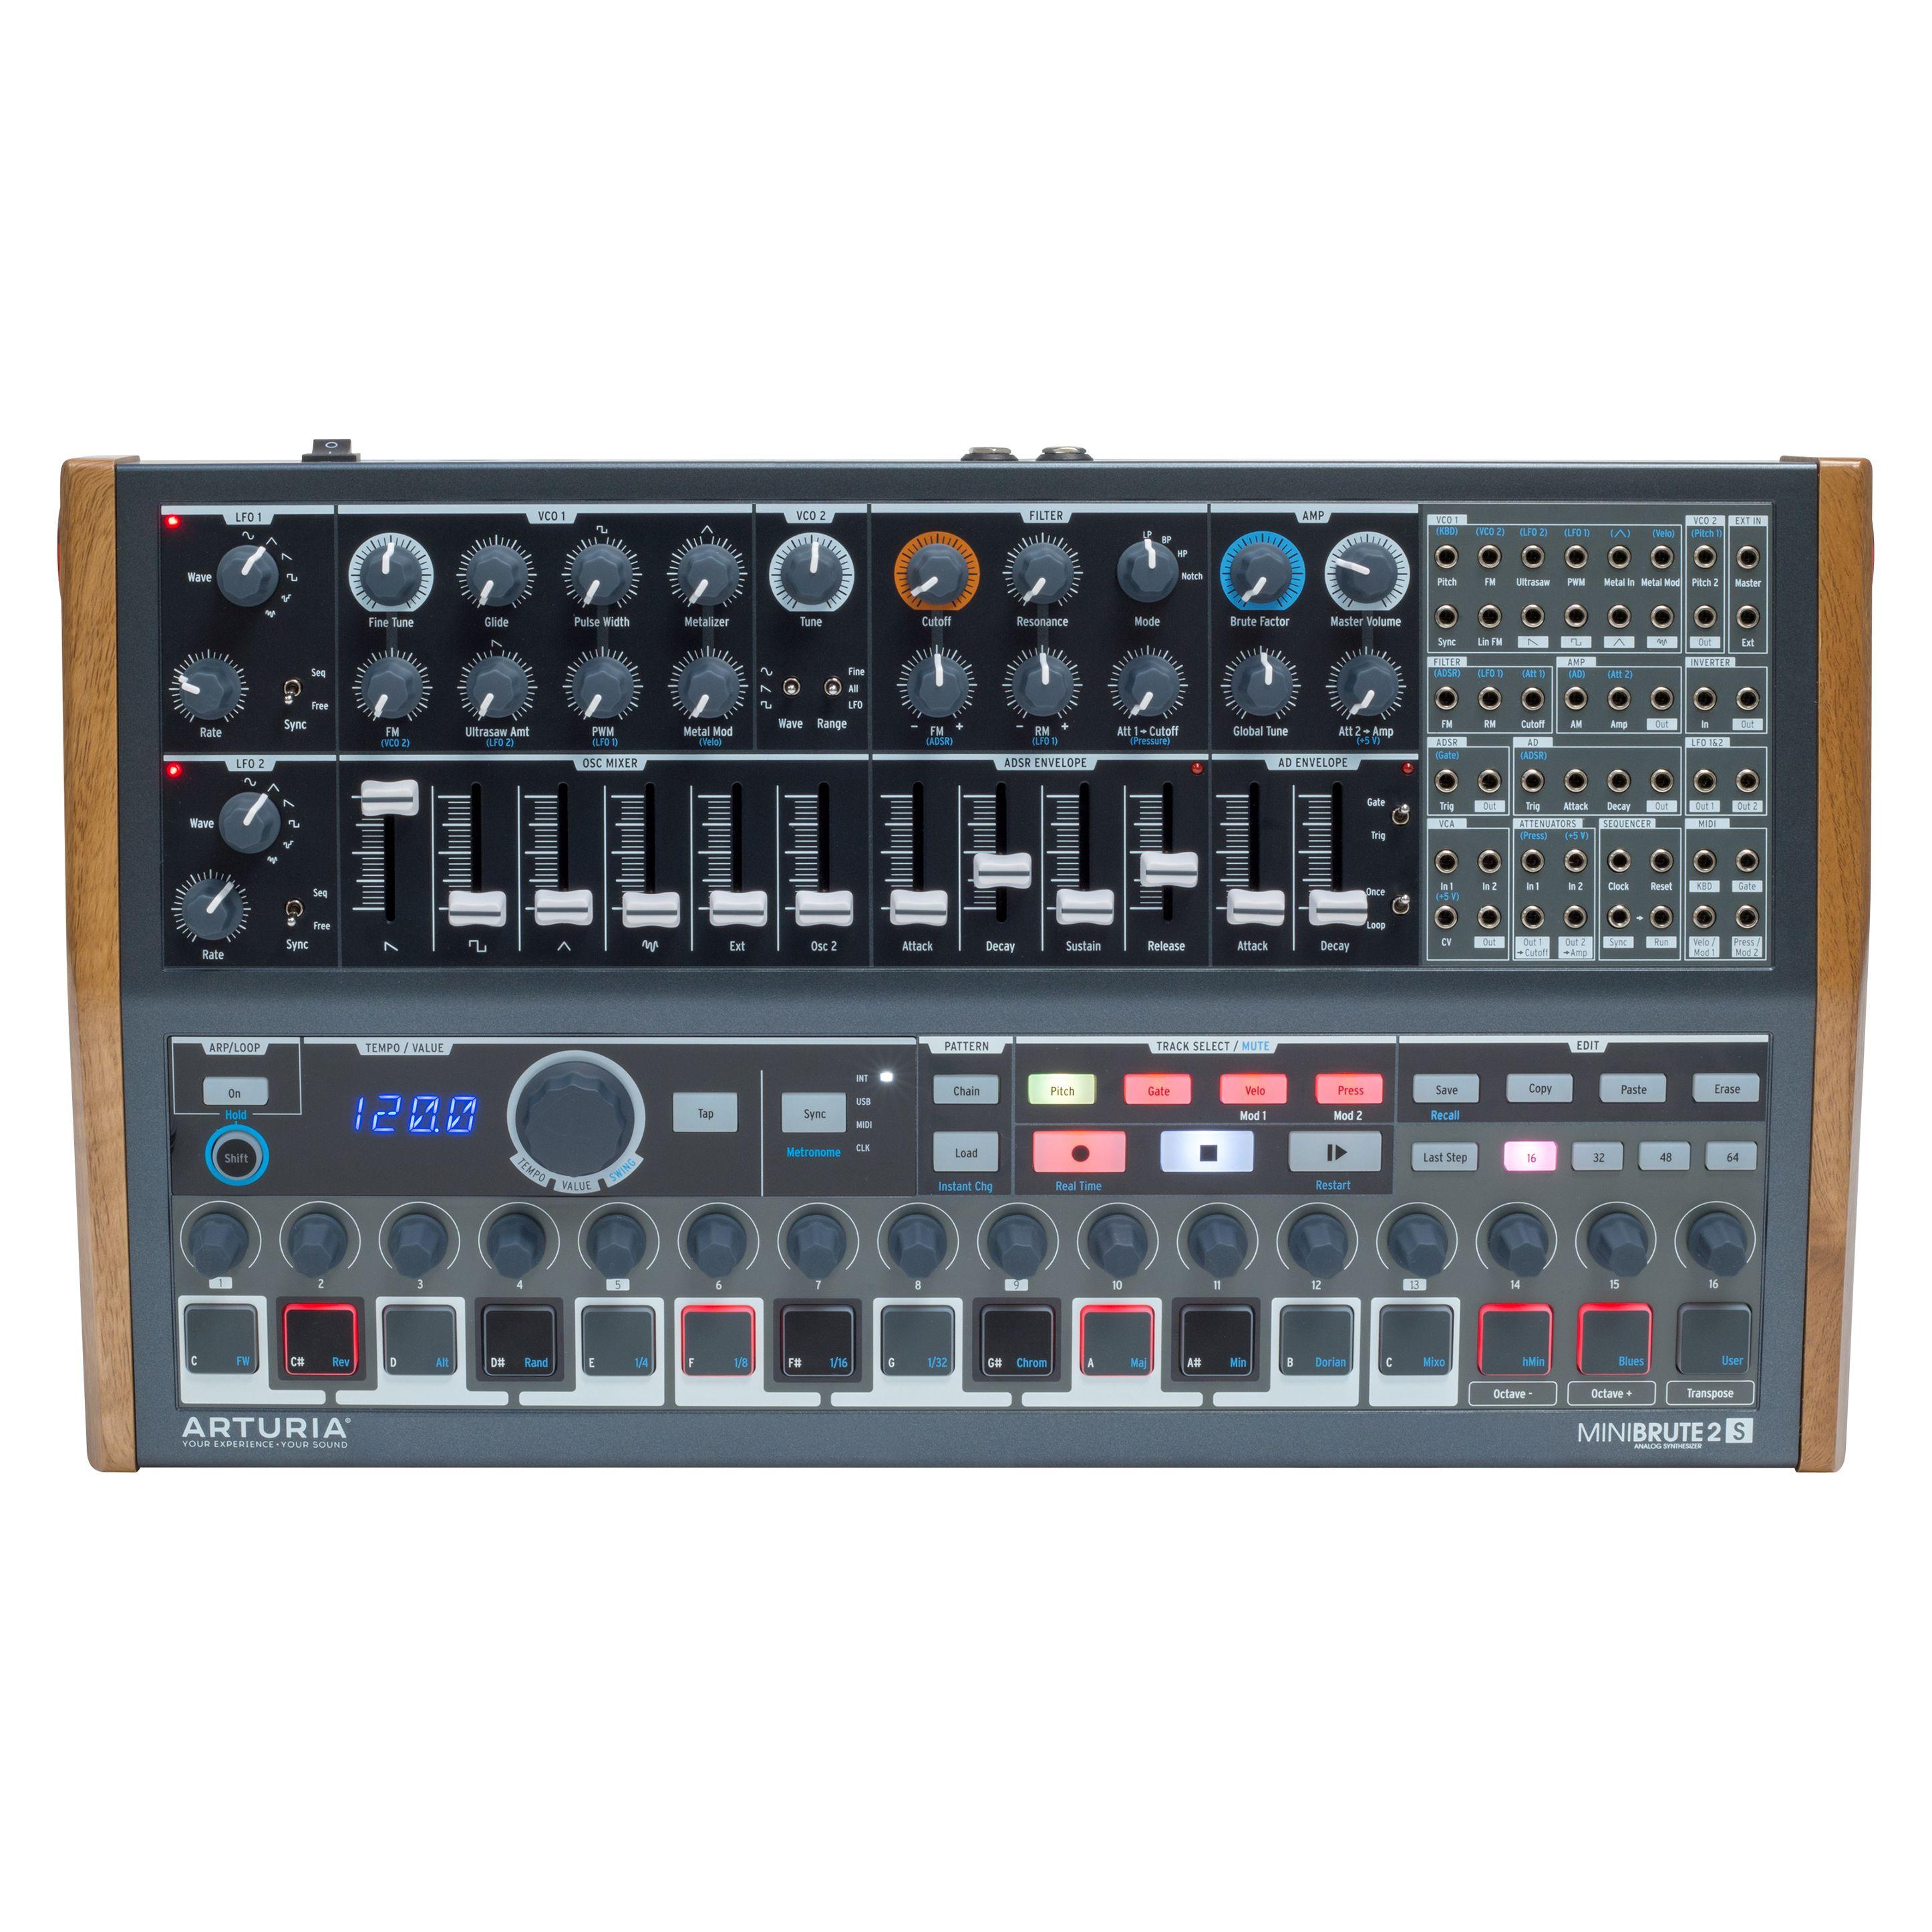 arturia minibrute 2s semi modular analog sequencing synth module rich tone music. Black Bedroom Furniture Sets. Home Design Ideas